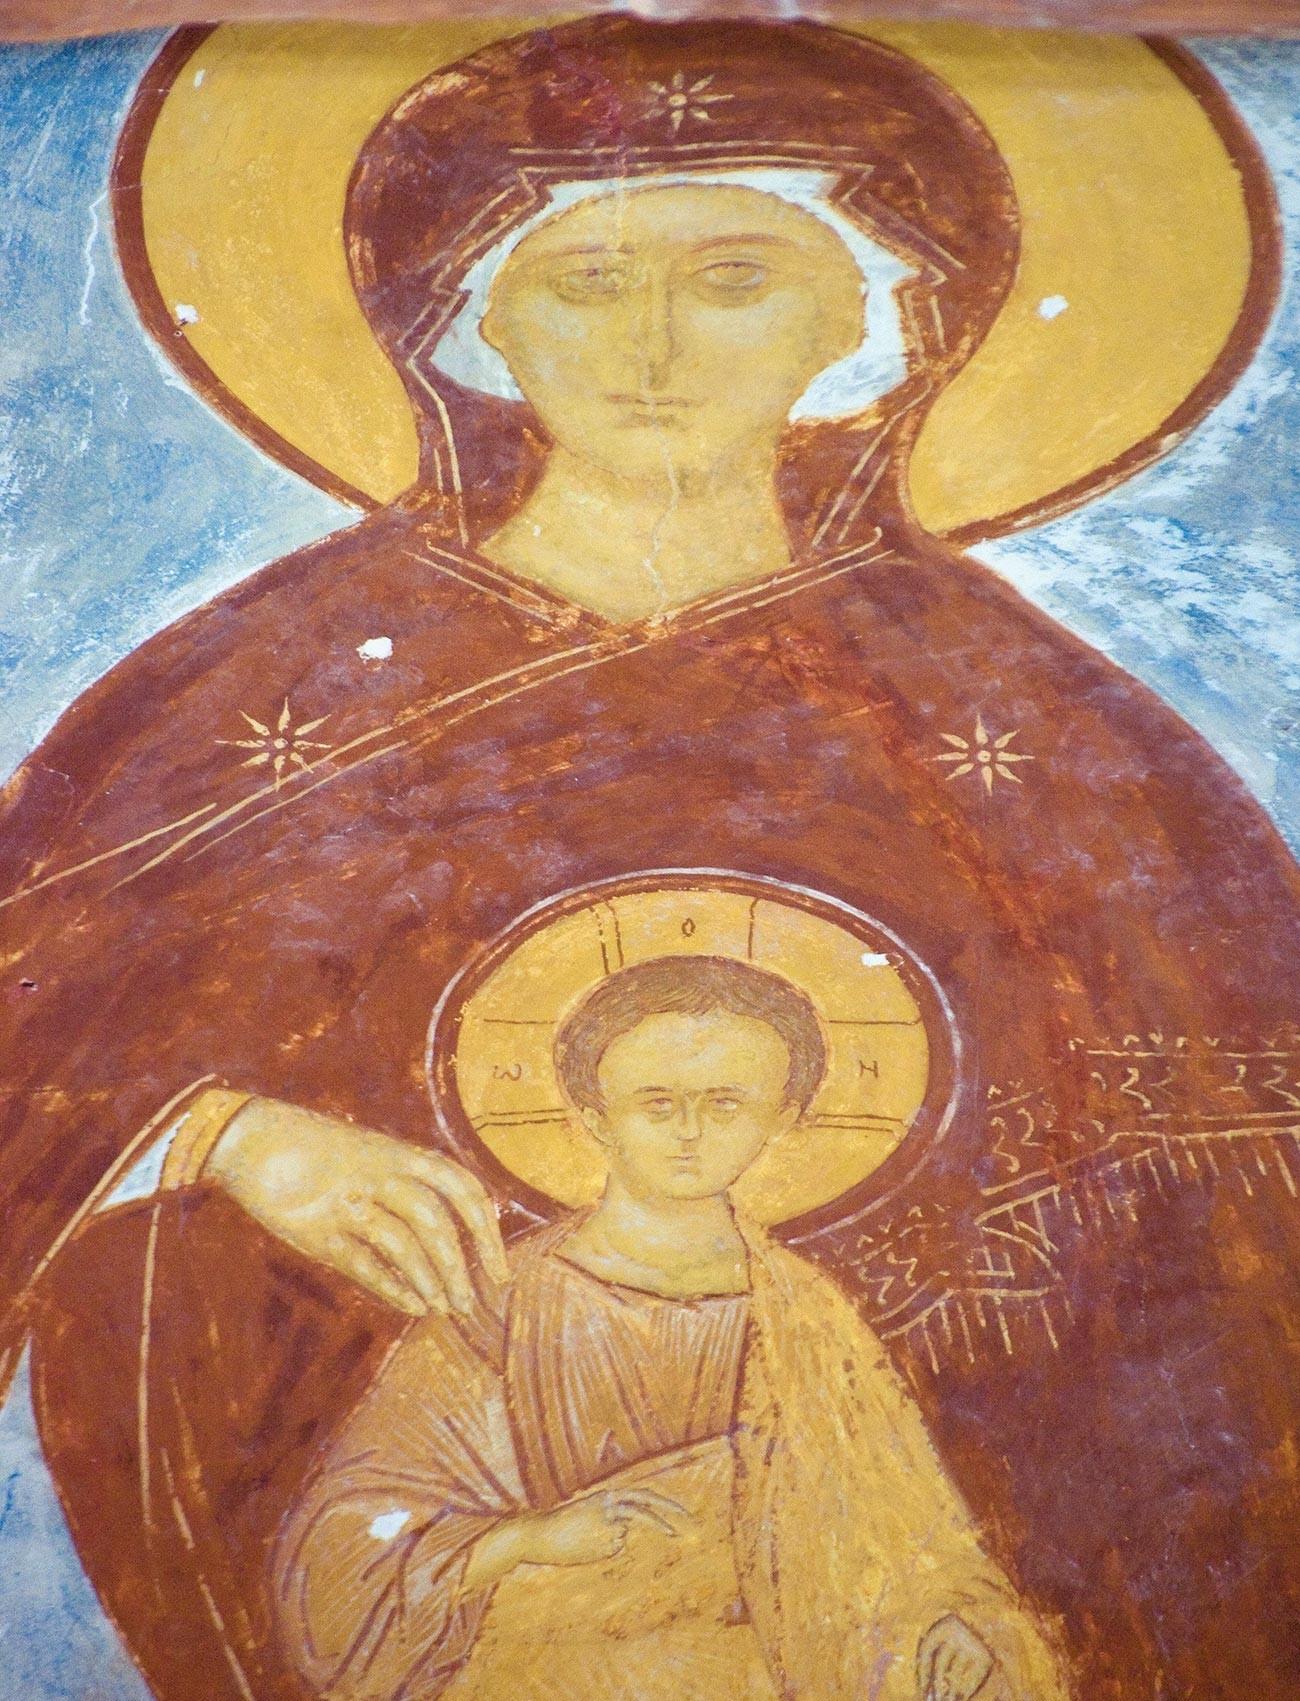 Katedrala rojstva Device Marije. Osrednja apsida. Freska Marije s Kristusom otrokom. 1. junij 2014